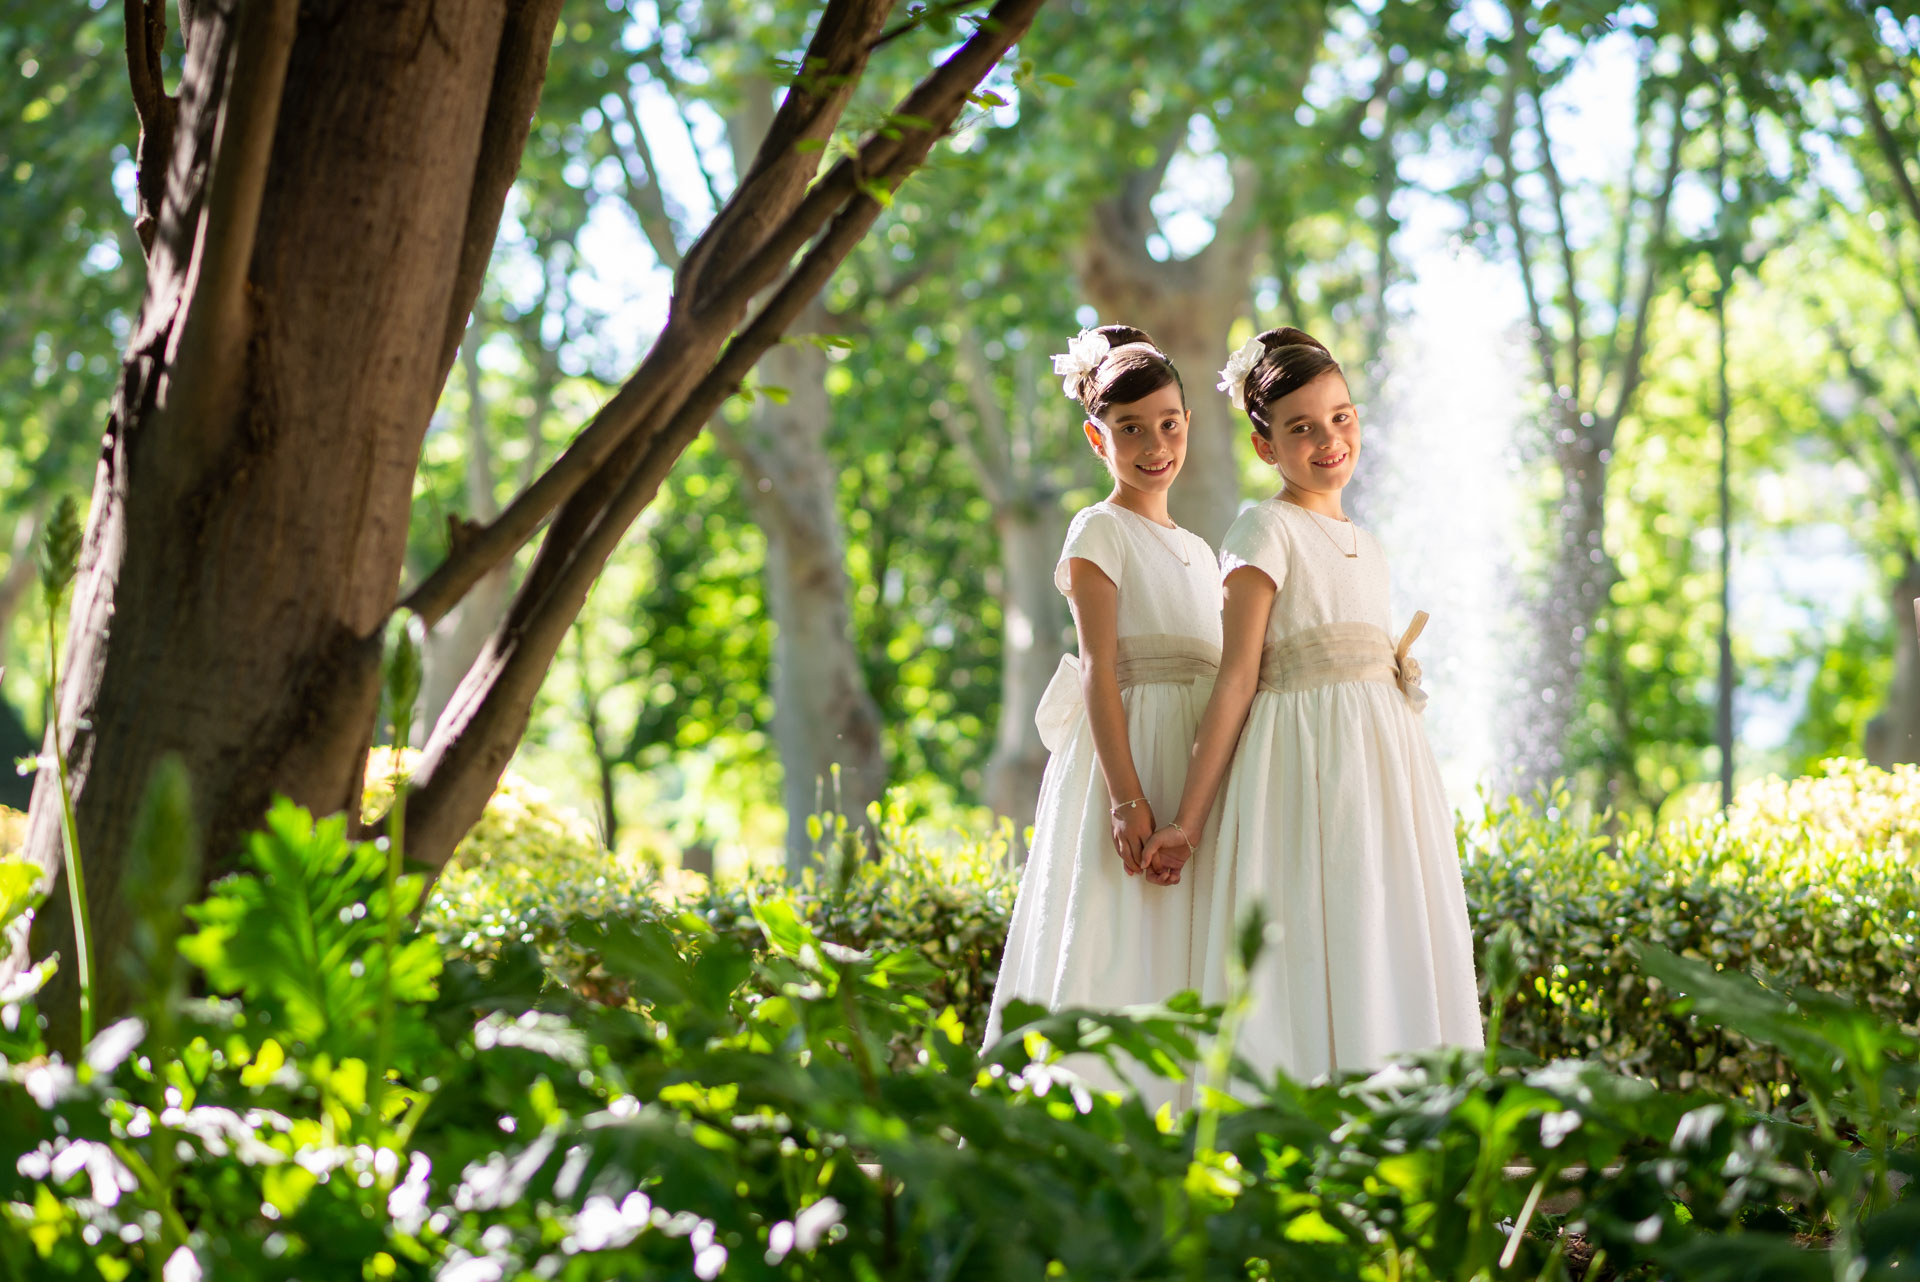 Isolda & Jordina